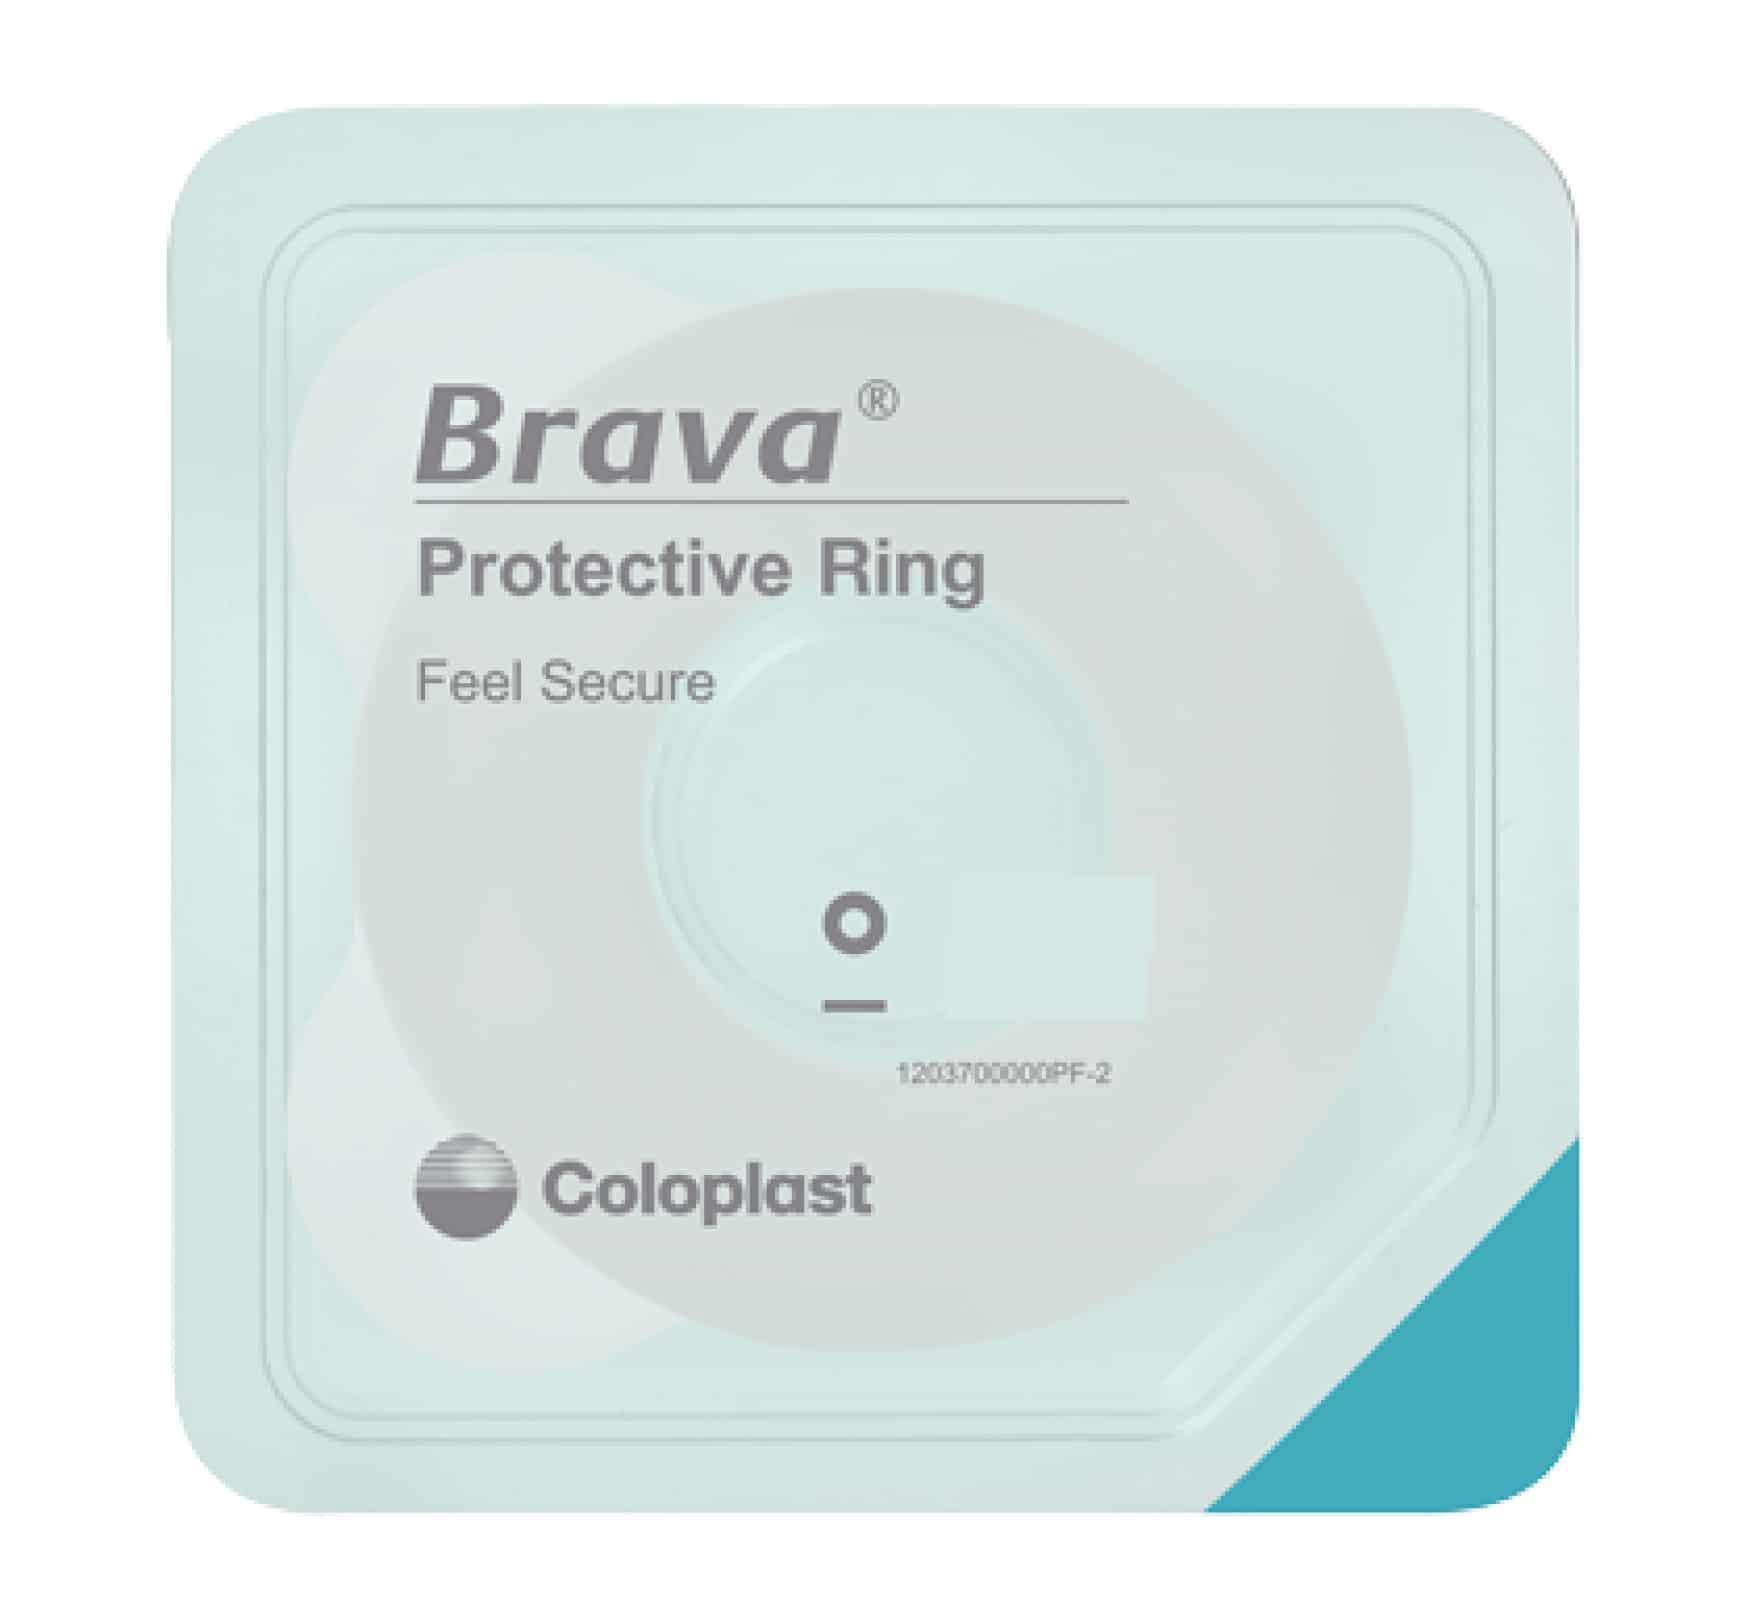 coloplast brava protective ring